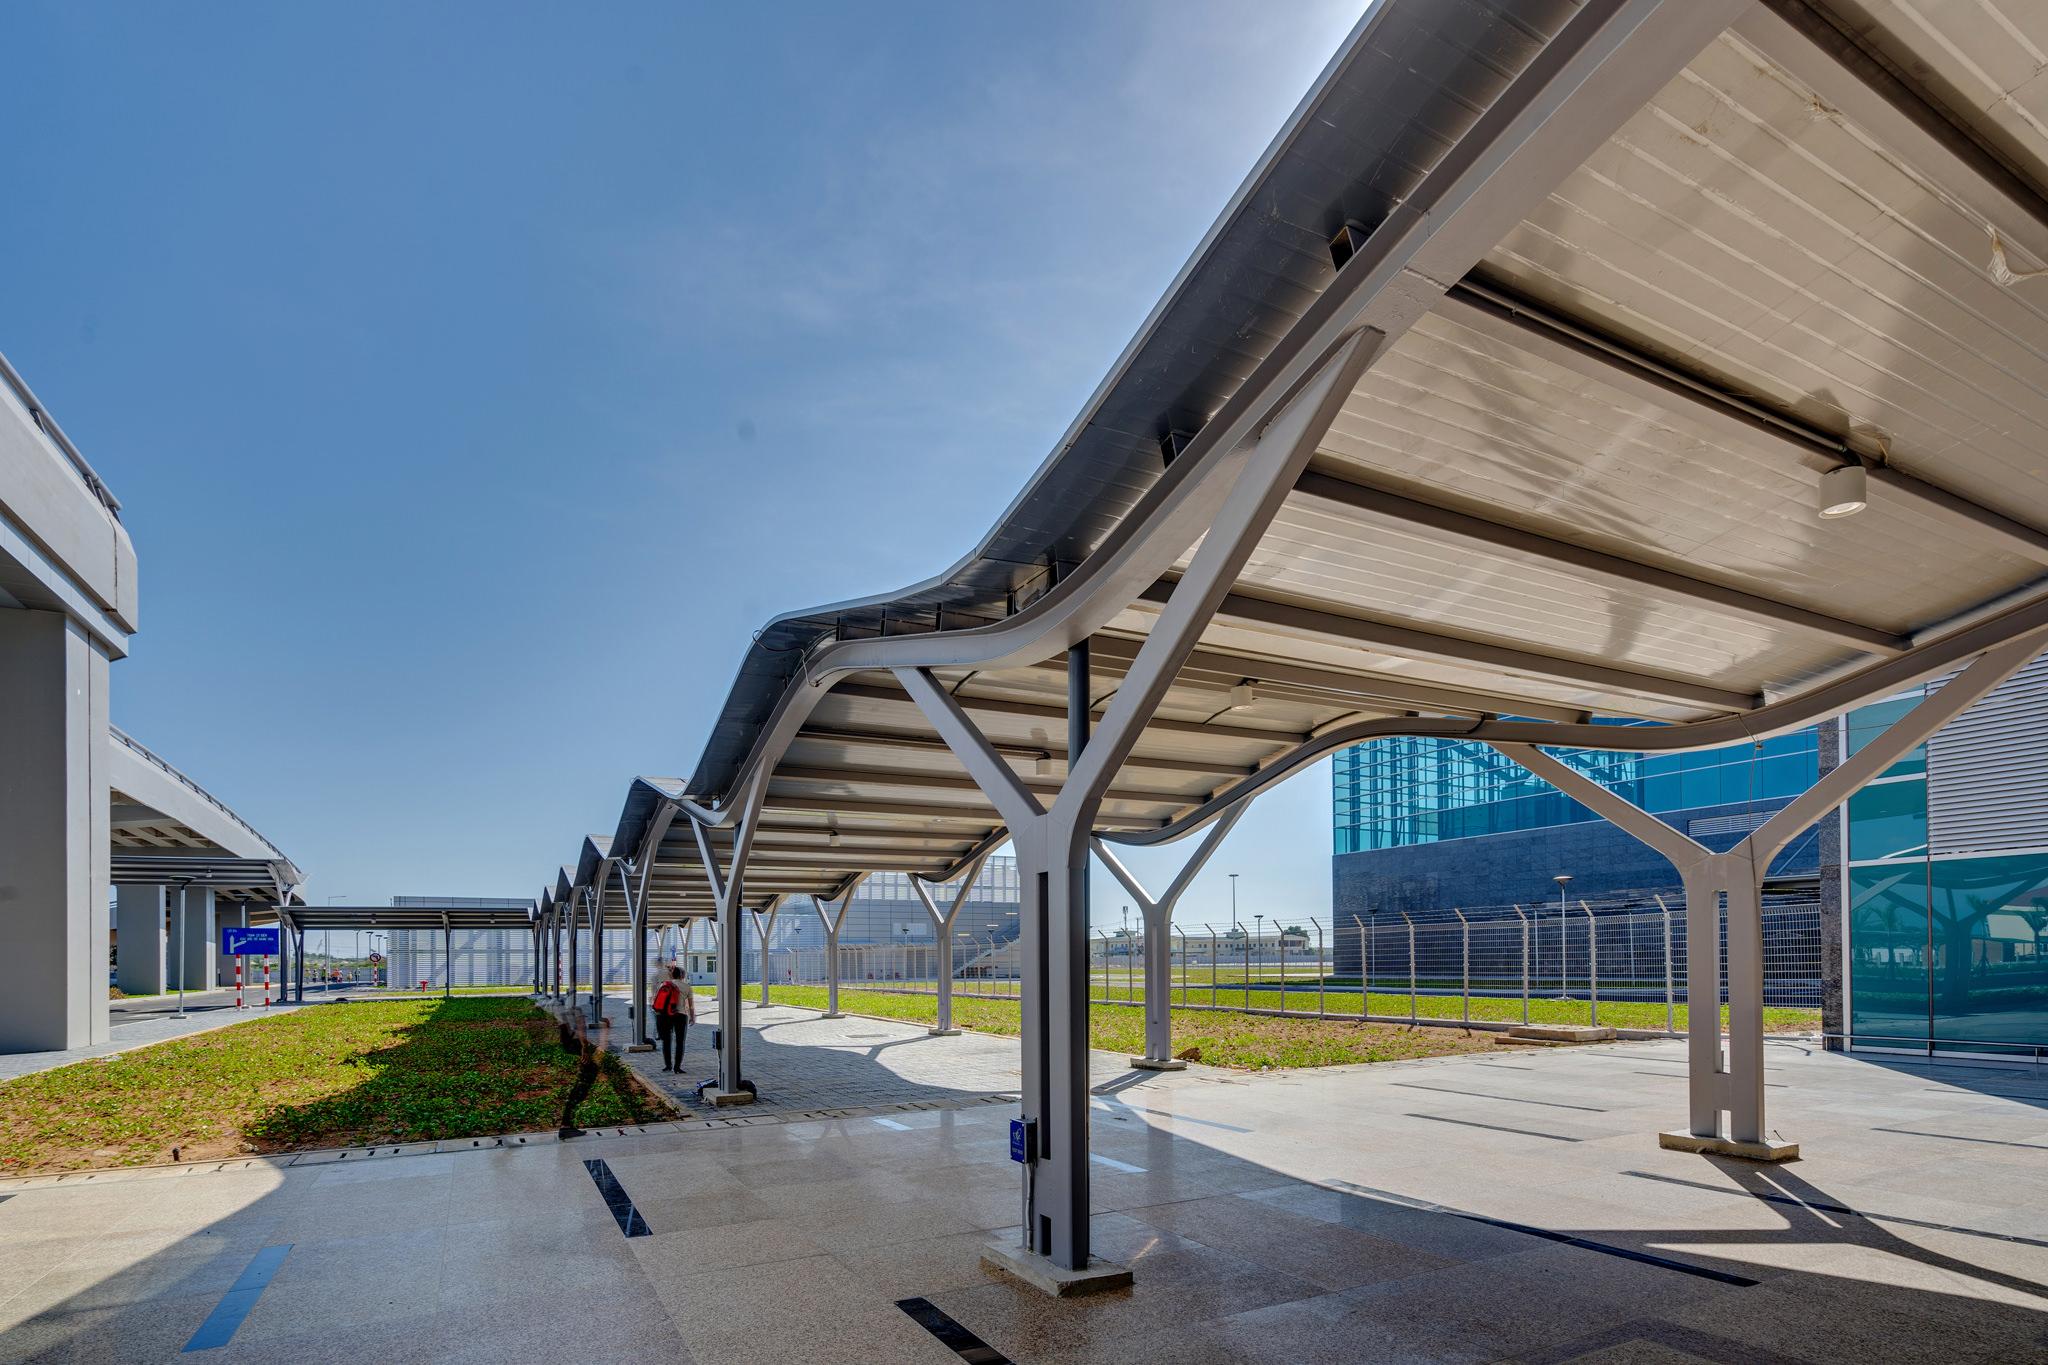 20180626 - Cam Ranh Airport - Architecture - 0222.jpg